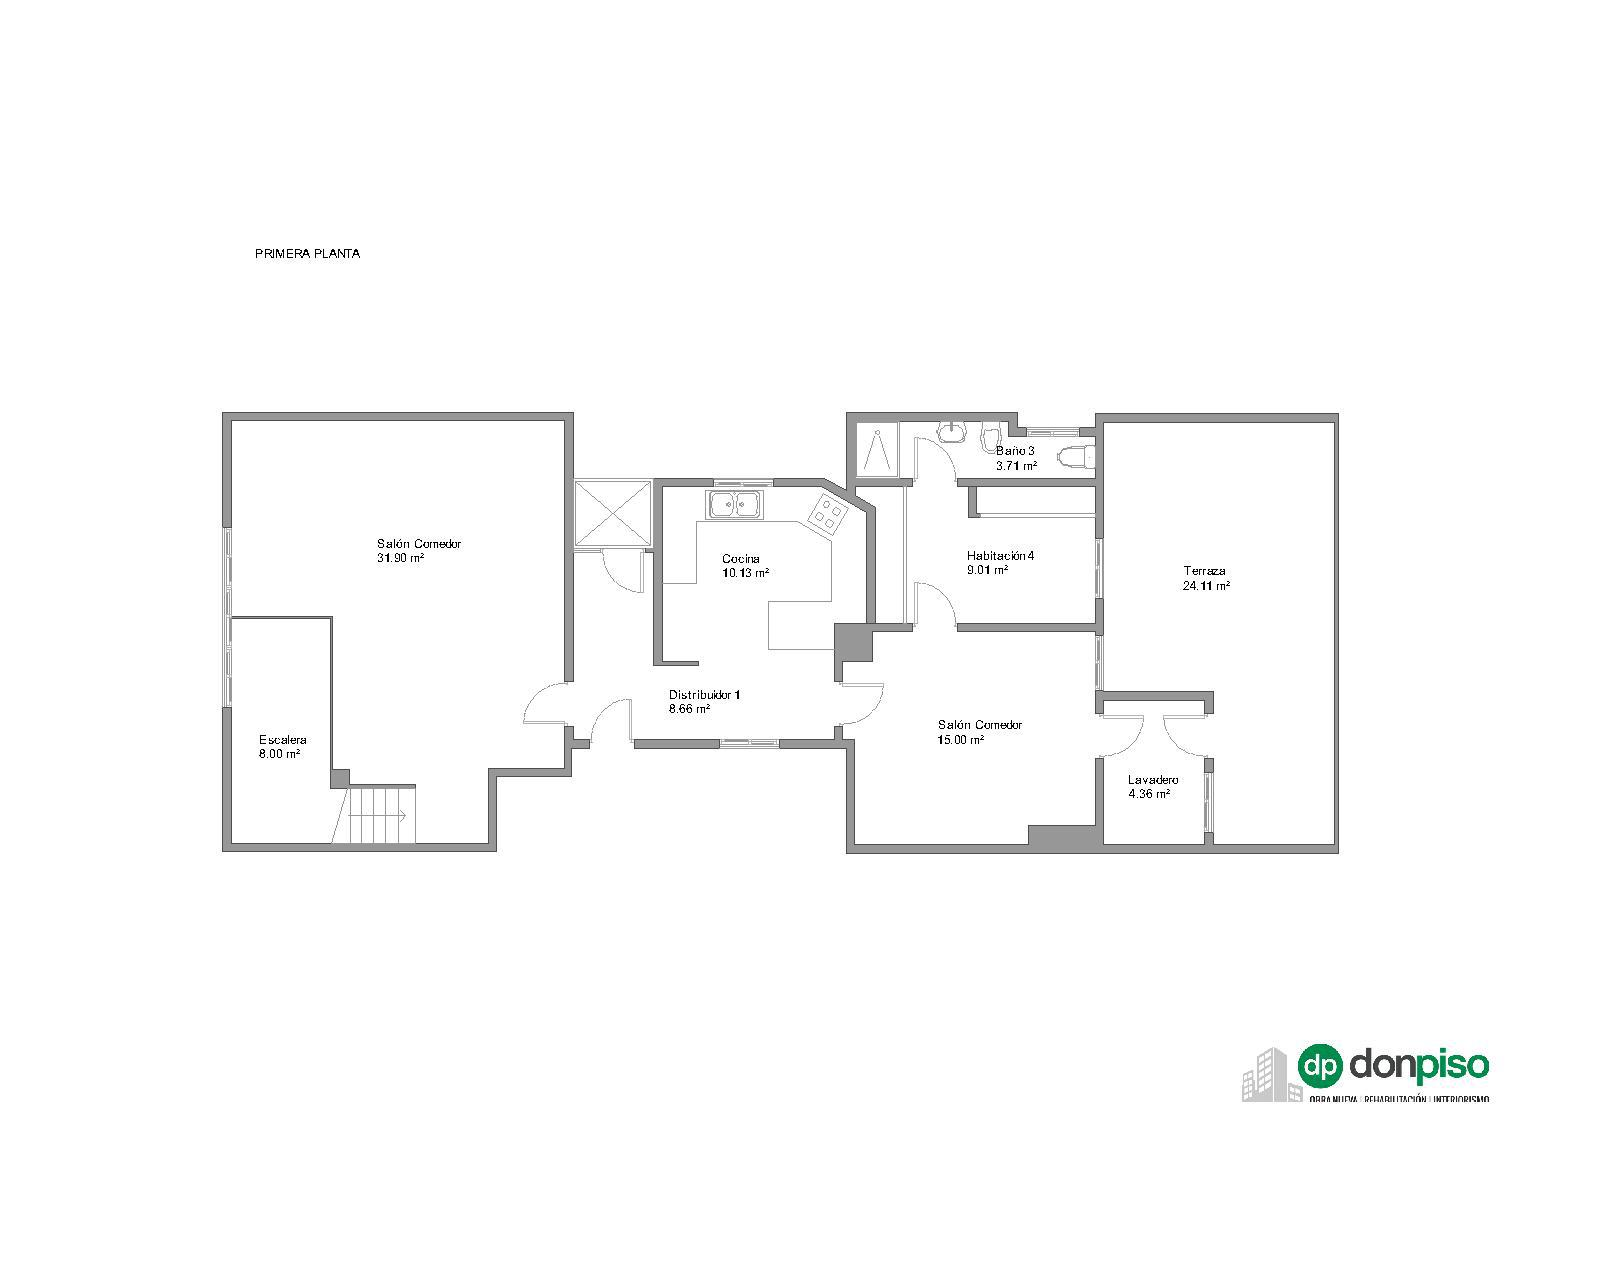 249314 Penthouse for sale in Sarrià-Sant Gervasi, Sant Gervasi-Galvany 35